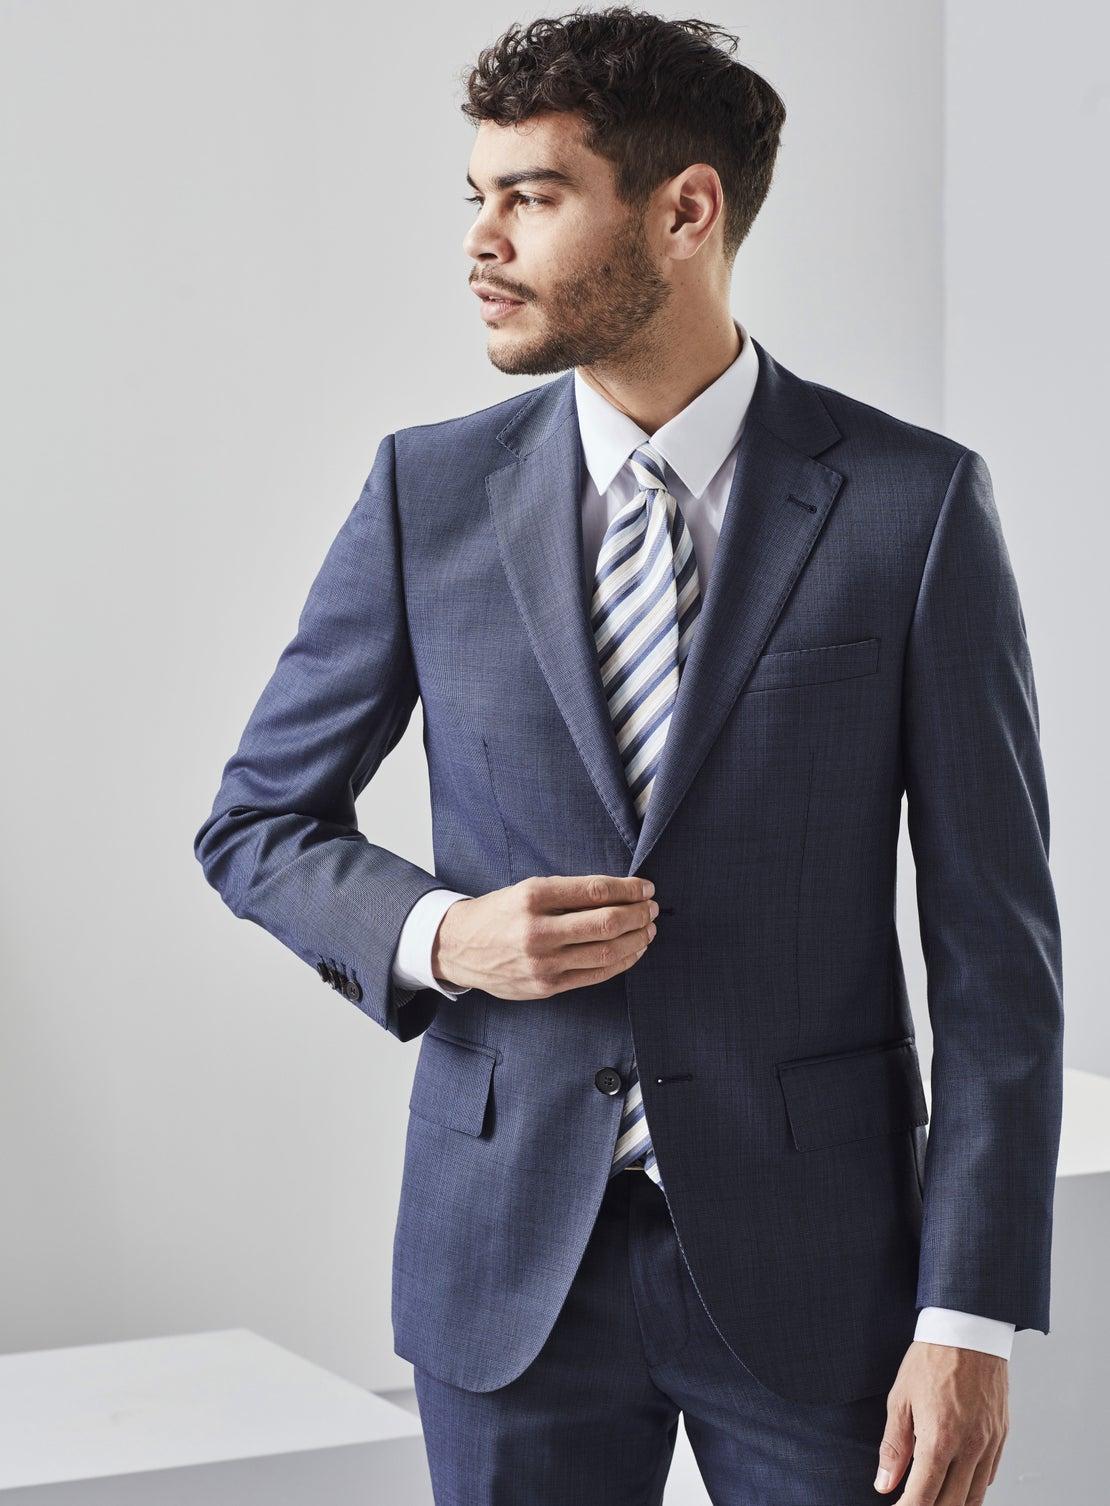 Carlton Cornflower Blue Nailhead Suit